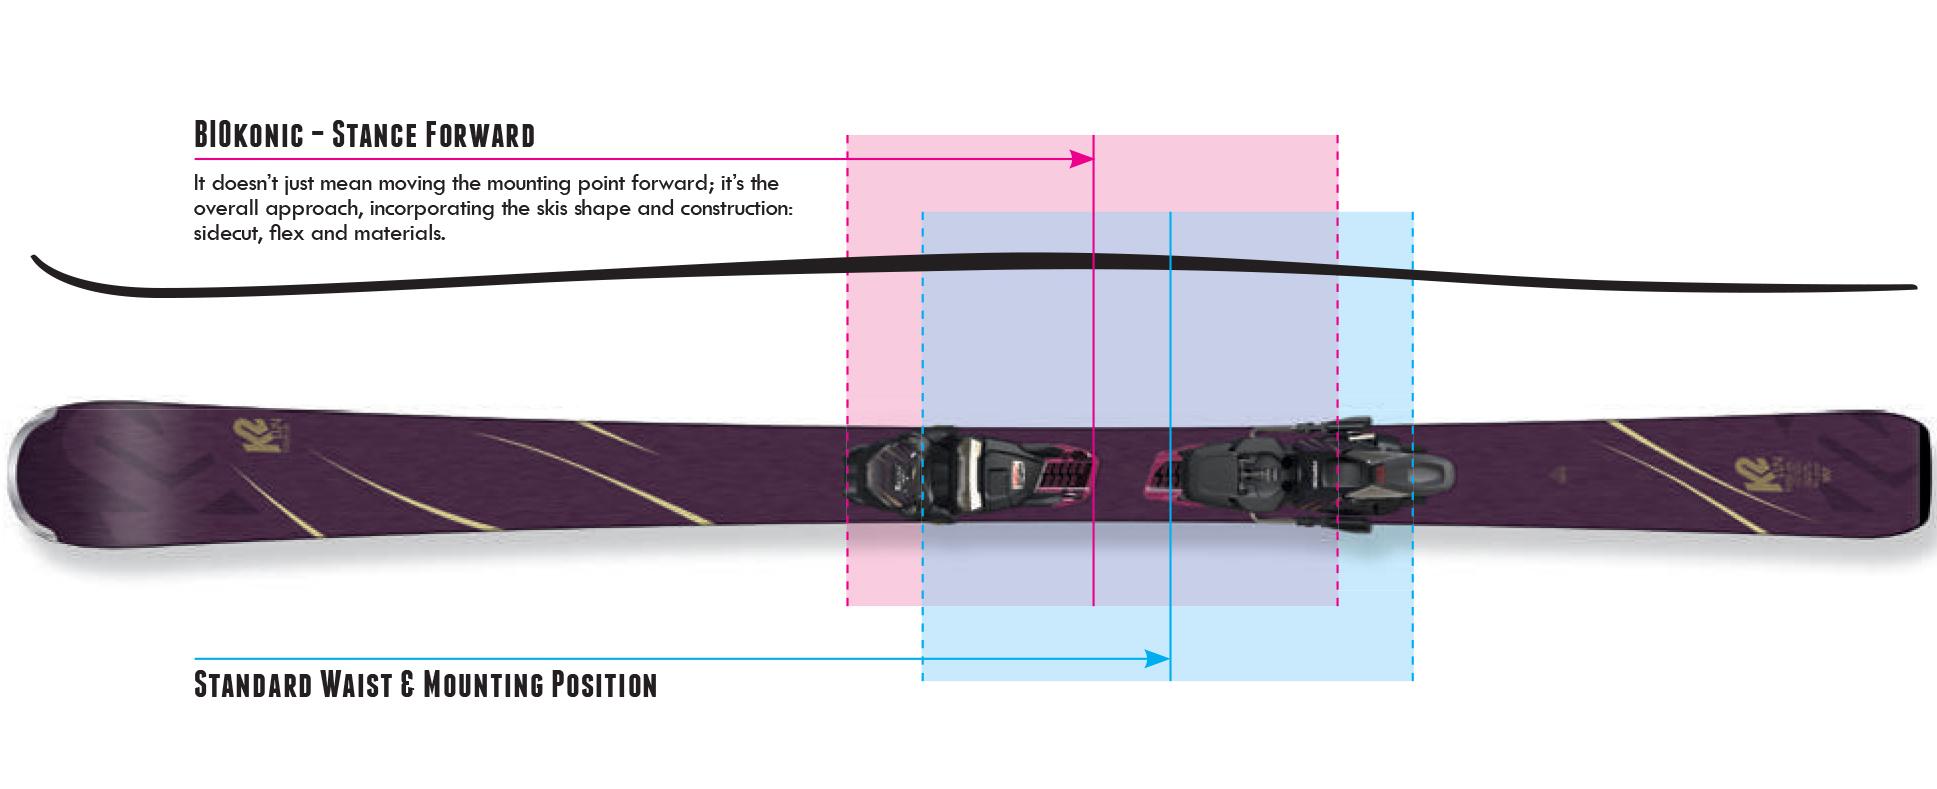 9fbf403c3a8 Van londen consultancy b.v